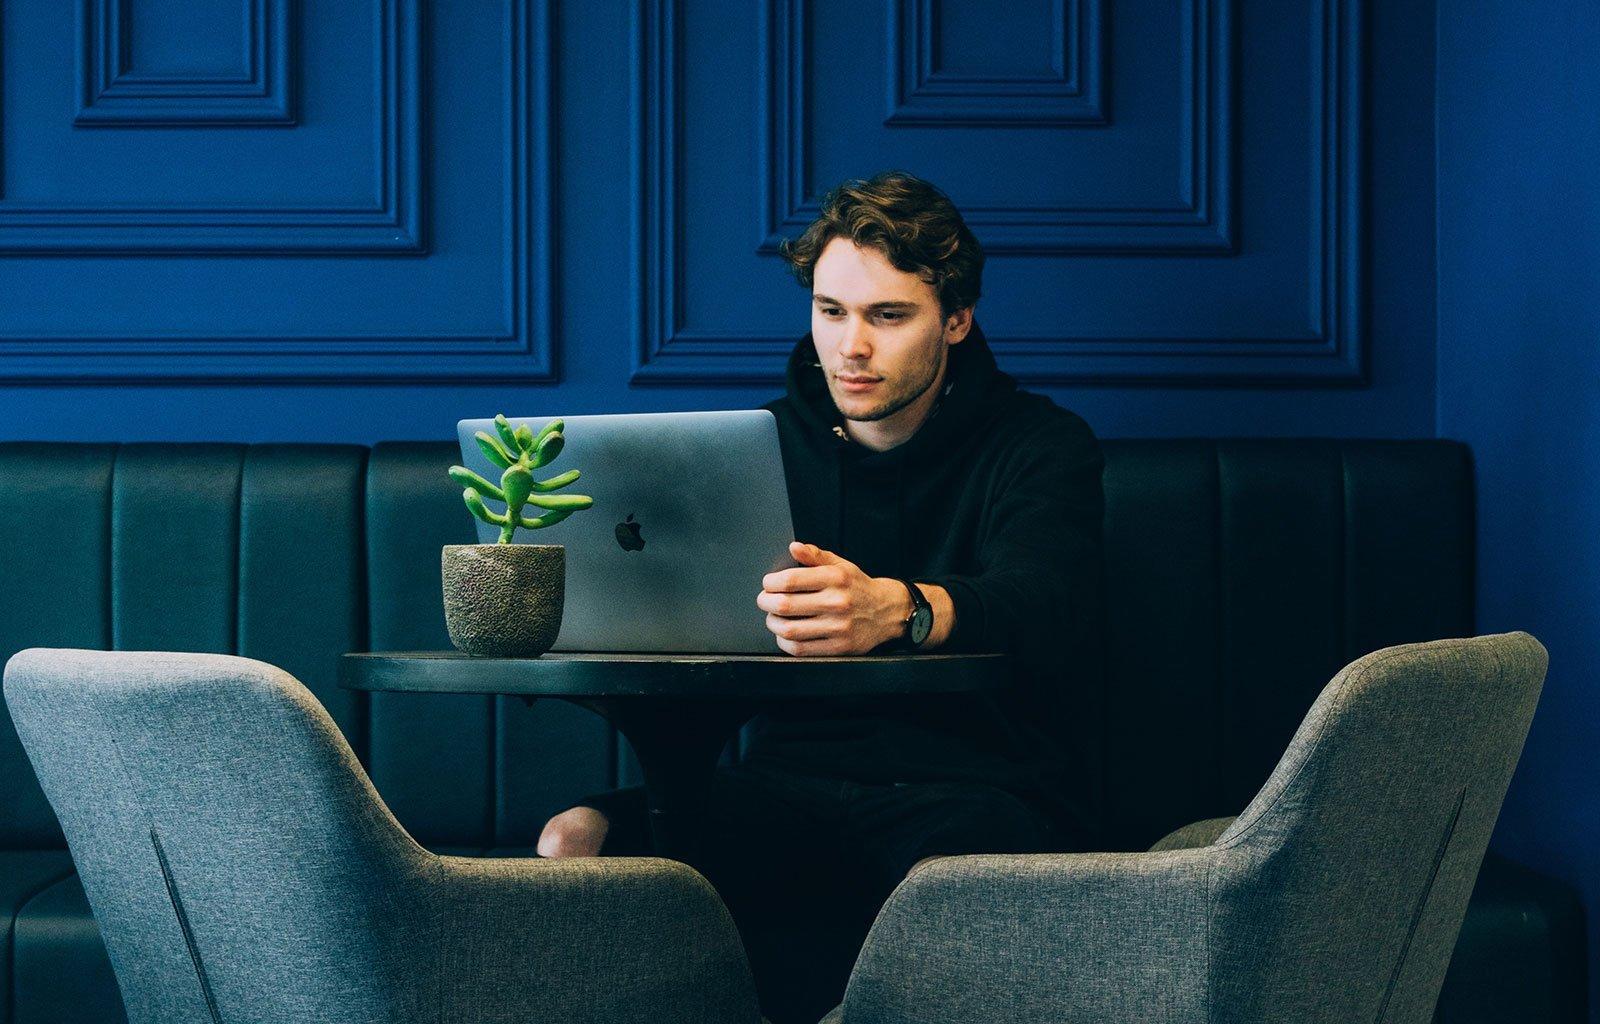 person sitting behind laptop